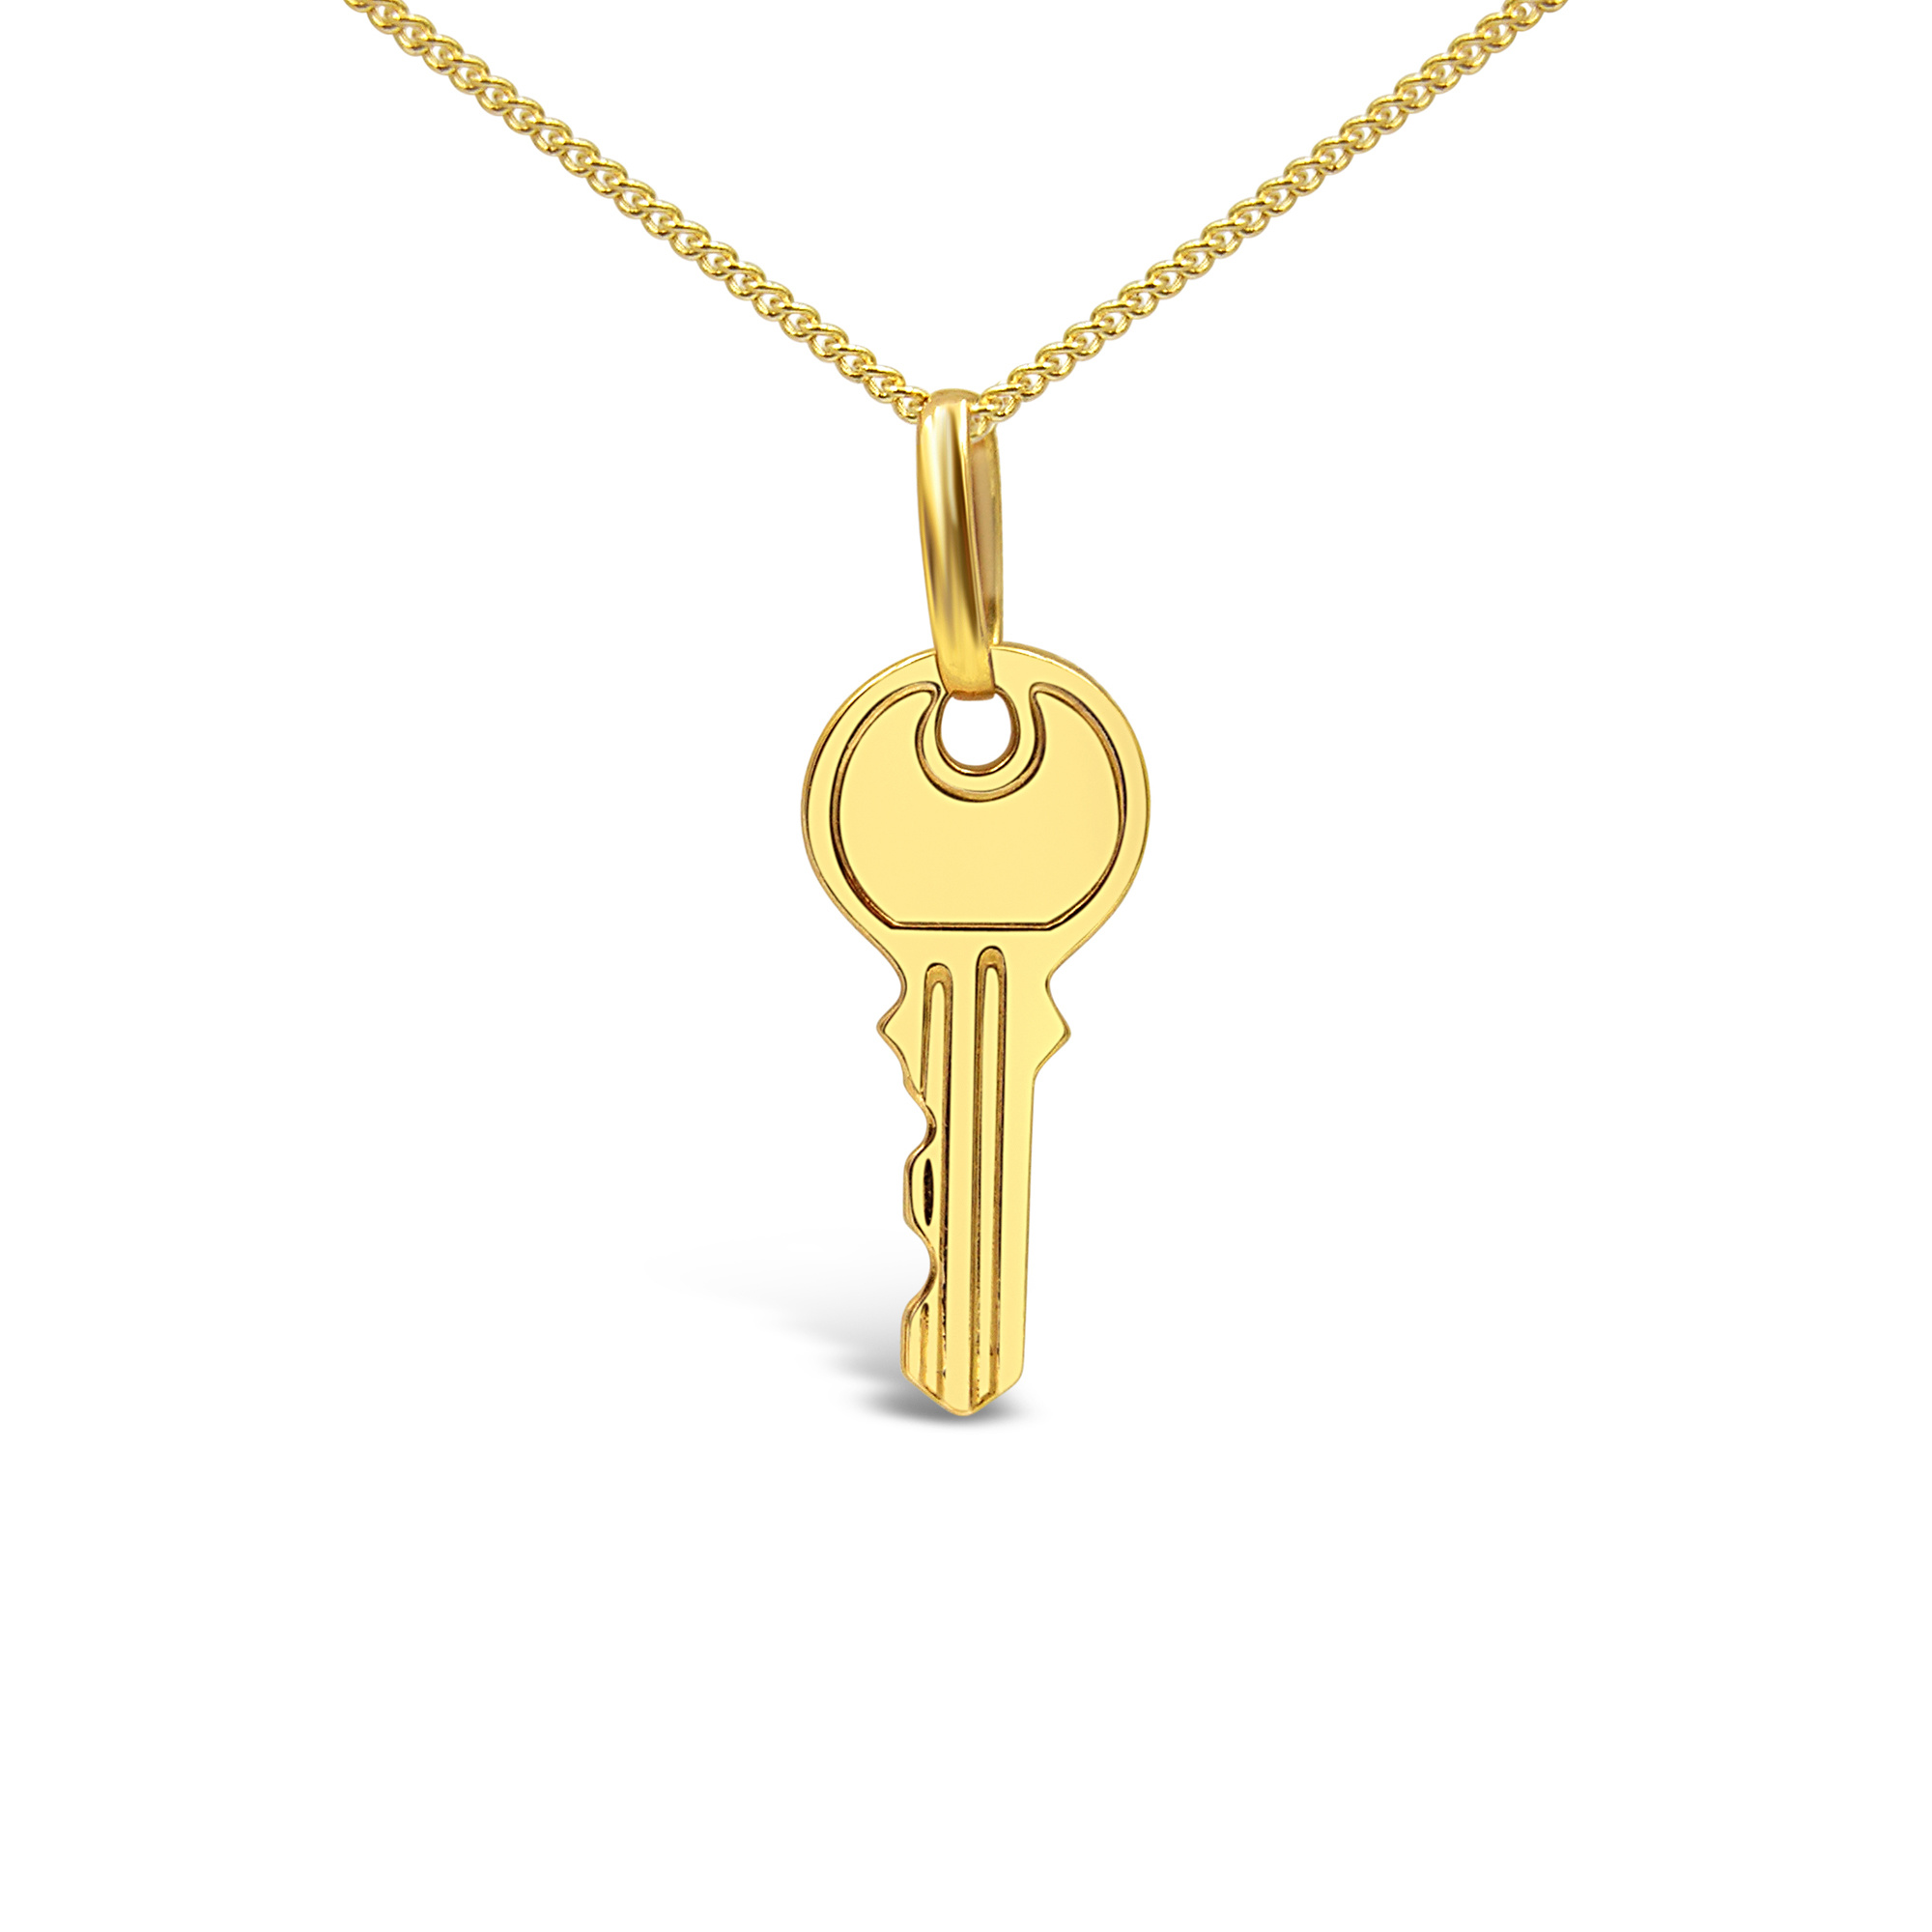 18 karat yellow gold key pendant